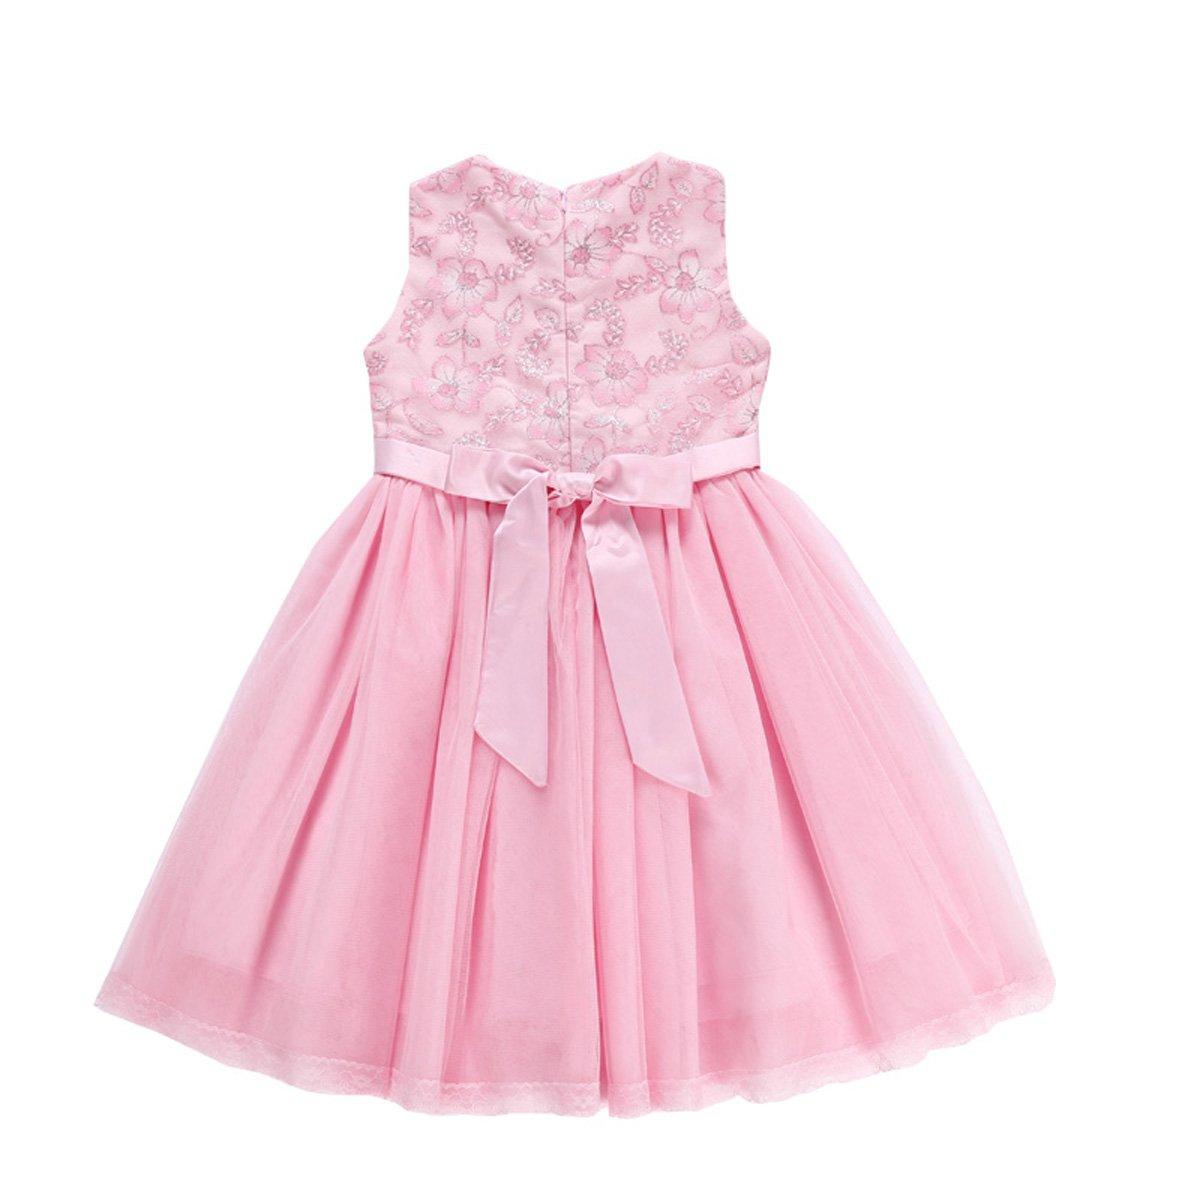 5702763303e Amazon.com  little dragon pig Kids Girl Vintage Dress Elegant Flower Tulle  Vacation Birthday Party Dresses  Clothing